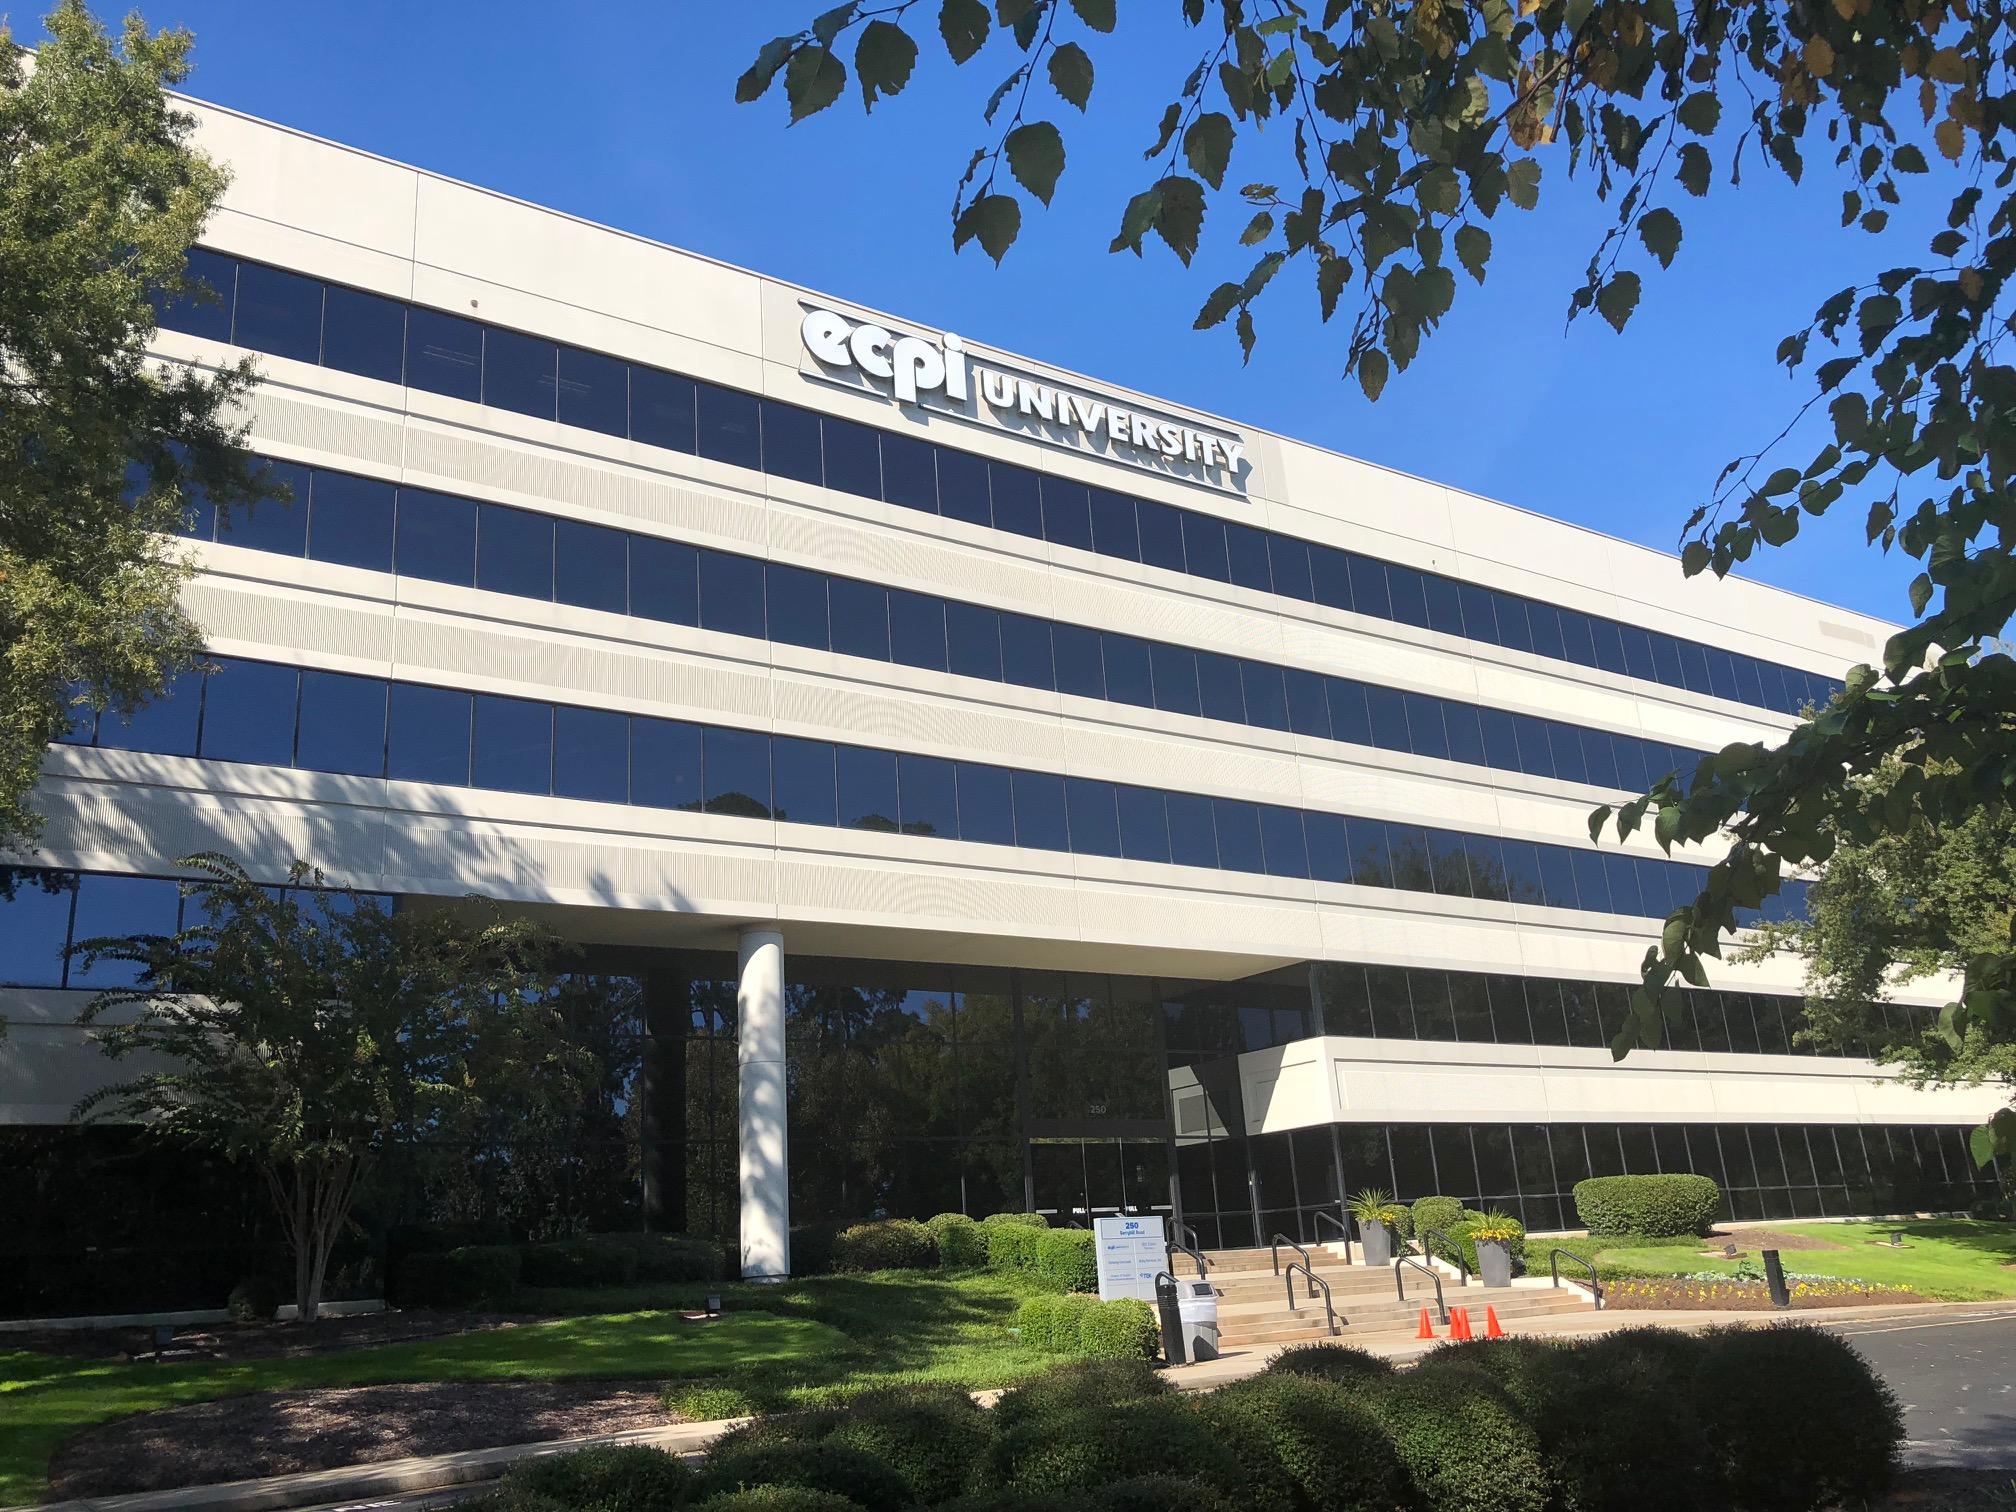 Columbia South Carolina Ecpi University